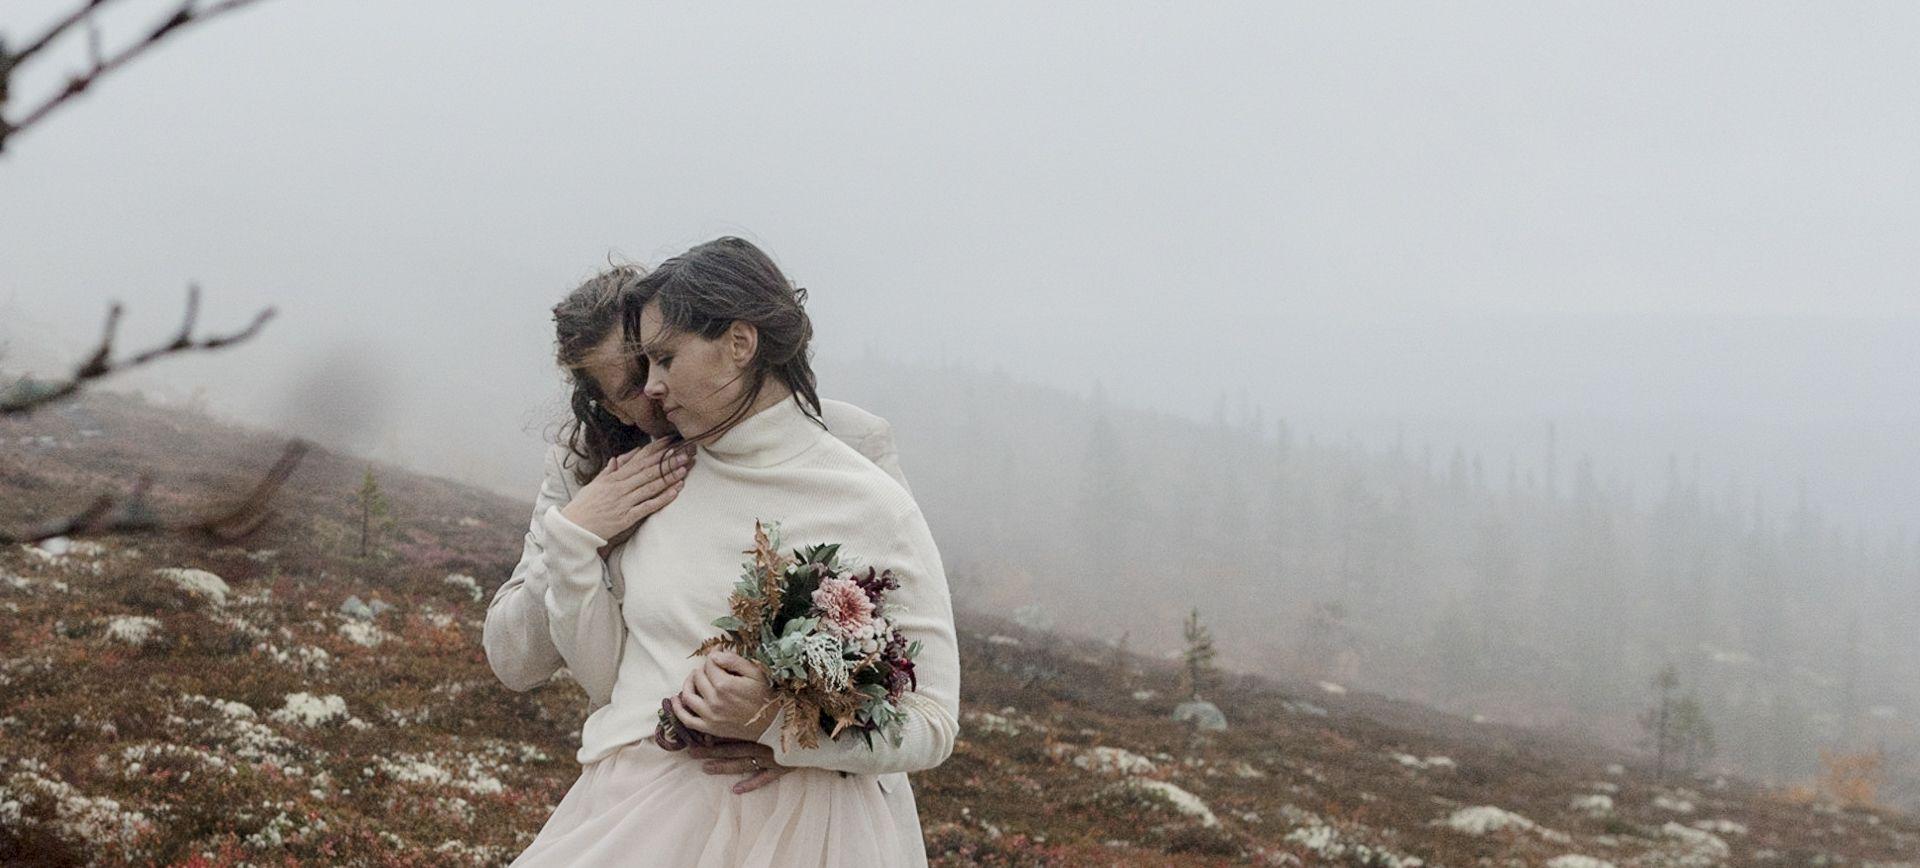 Glamping wedding in sweden - waterfall adventure wedding packages